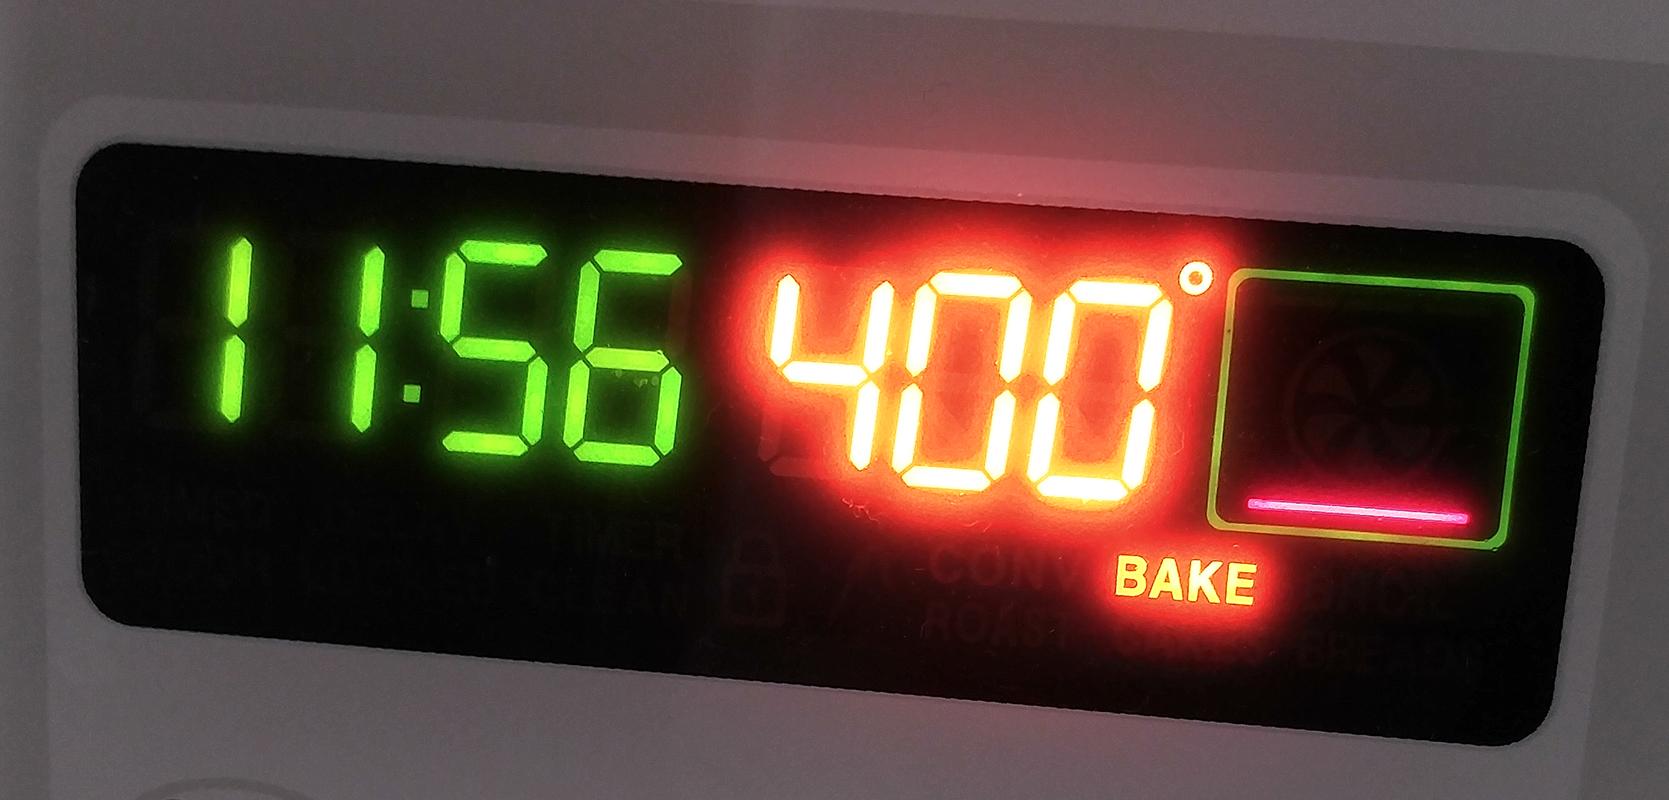 400 degrees F